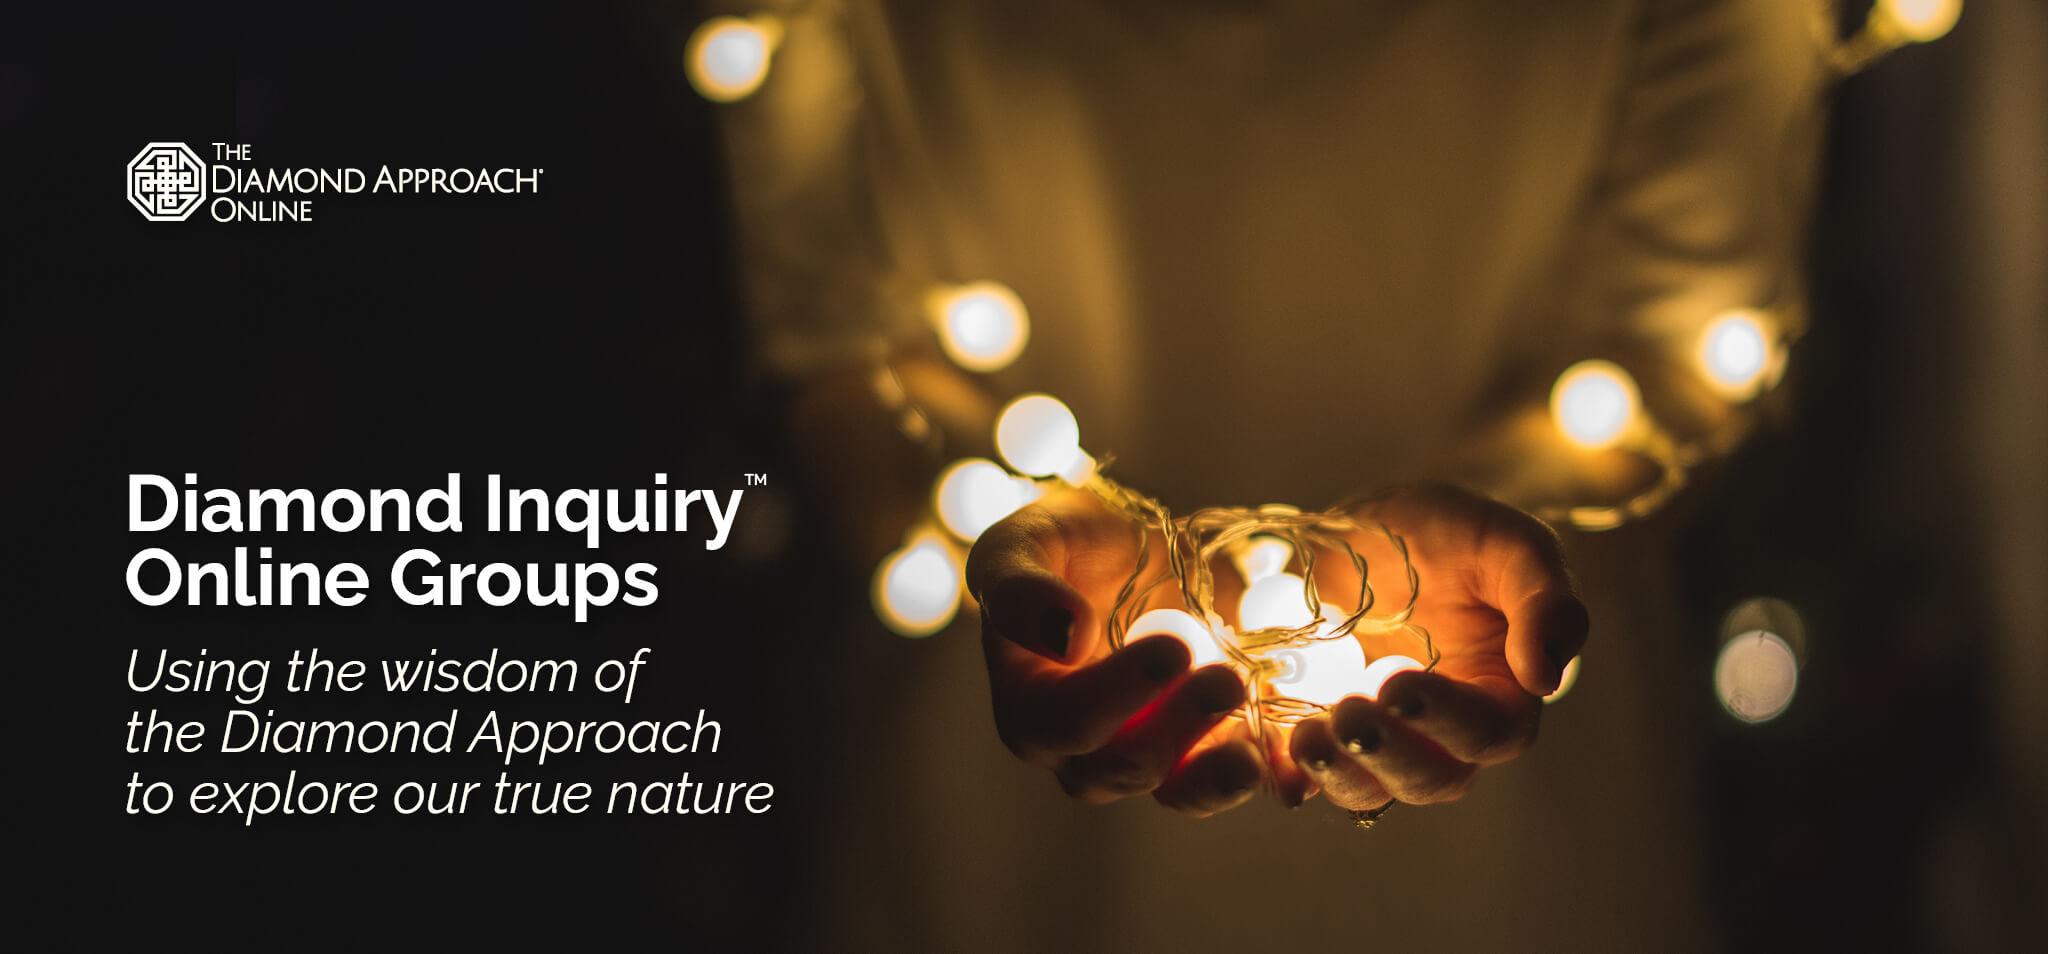 Diamond Inquiry Online Groups